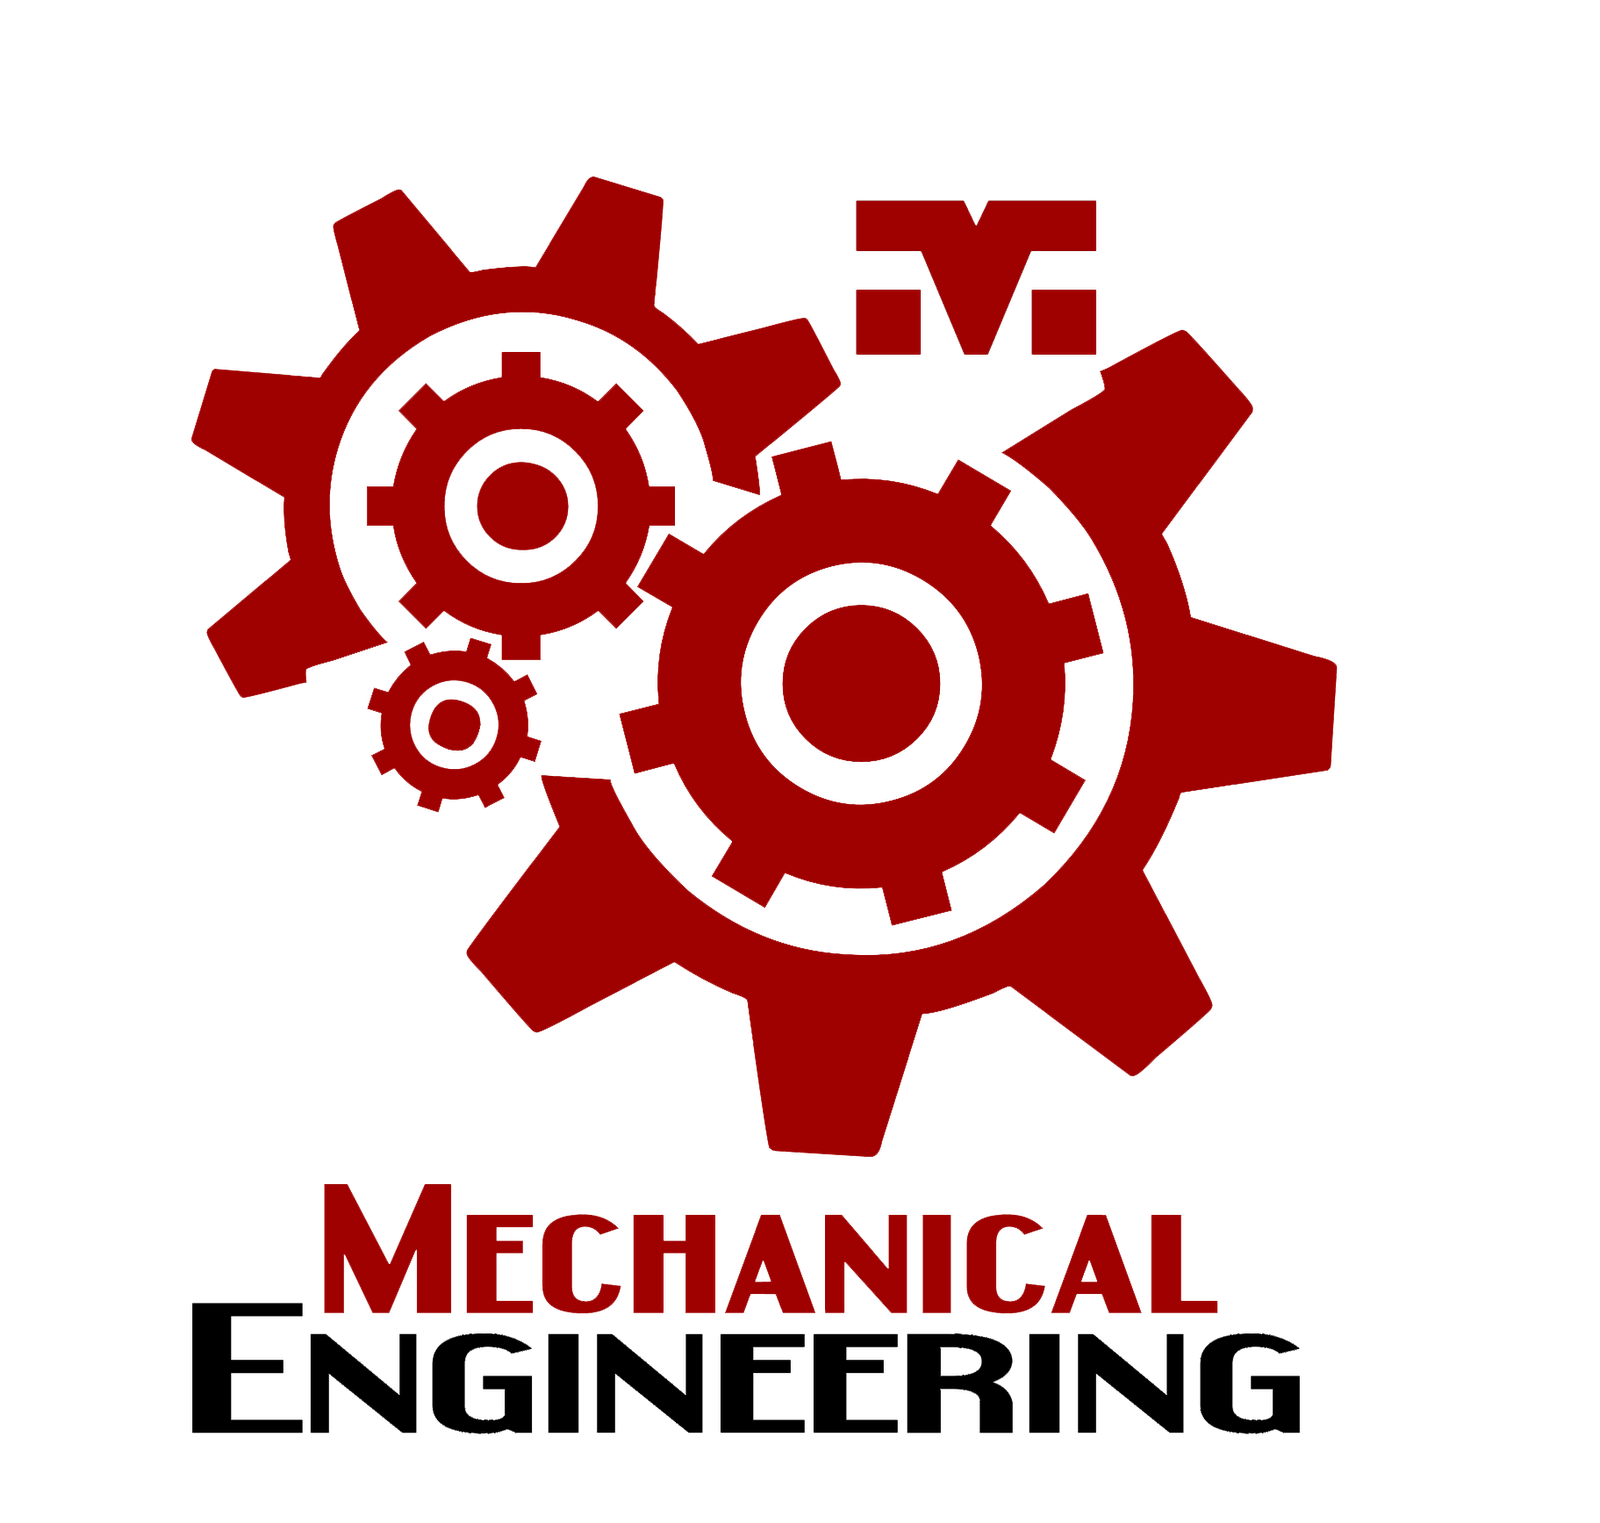 Mechanical engineering logo - photo#1